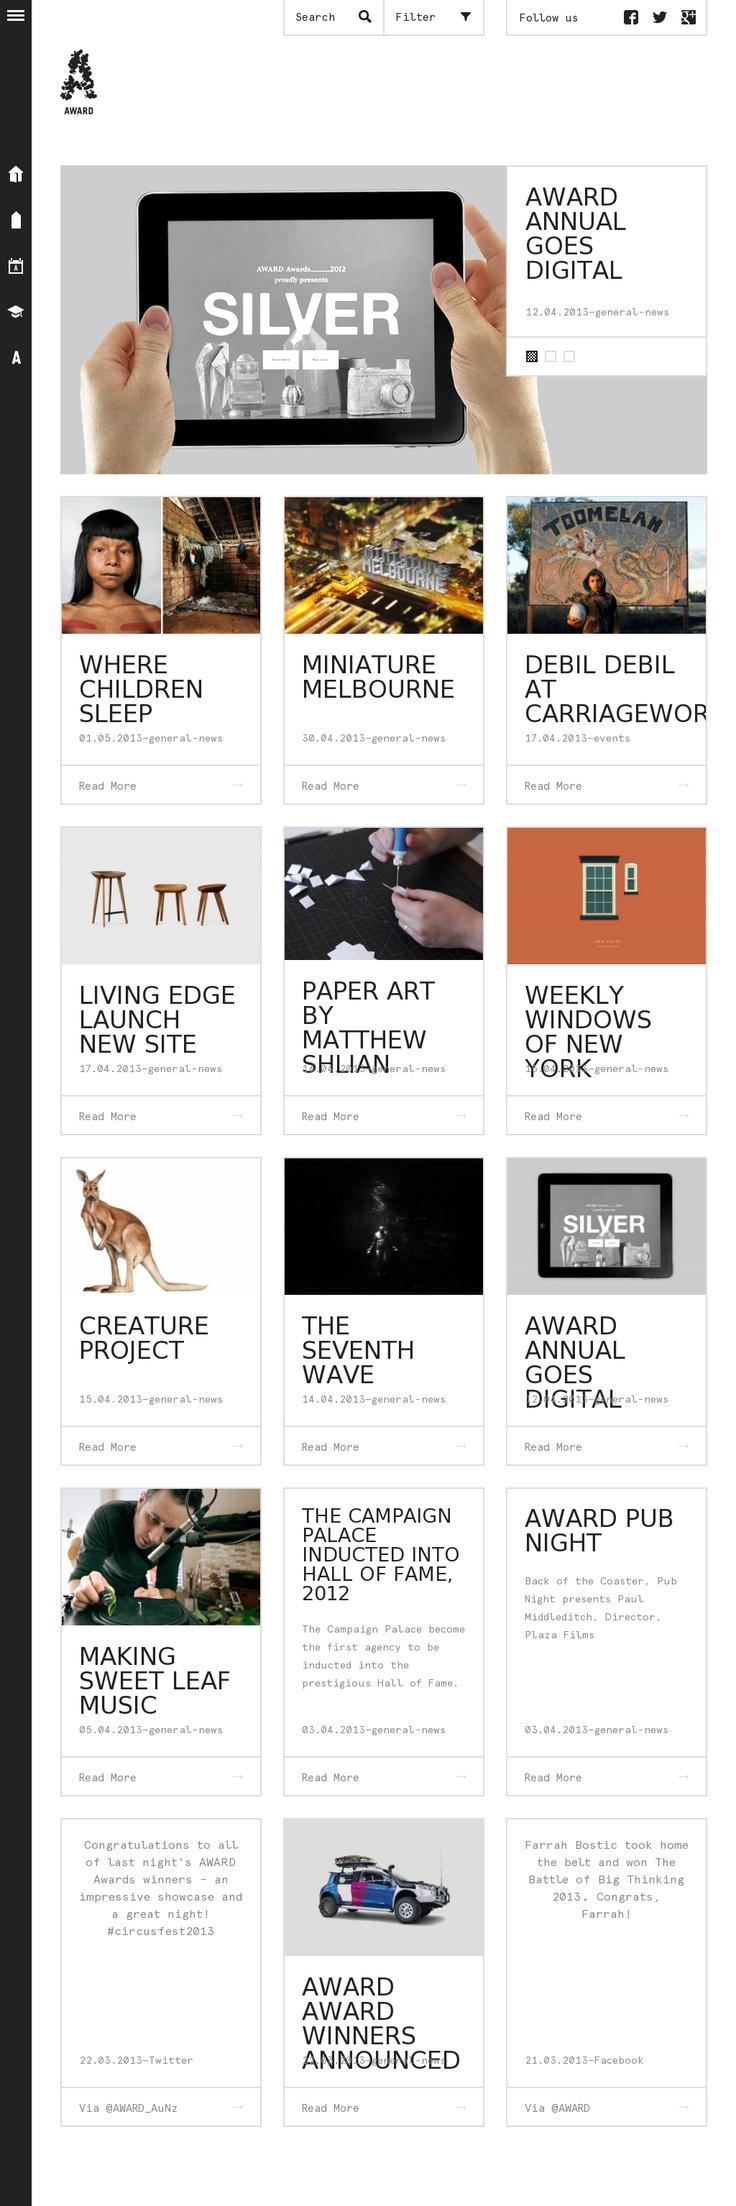 Award Online Digital Magazine: Grid based website layout design https://www.domainki.com